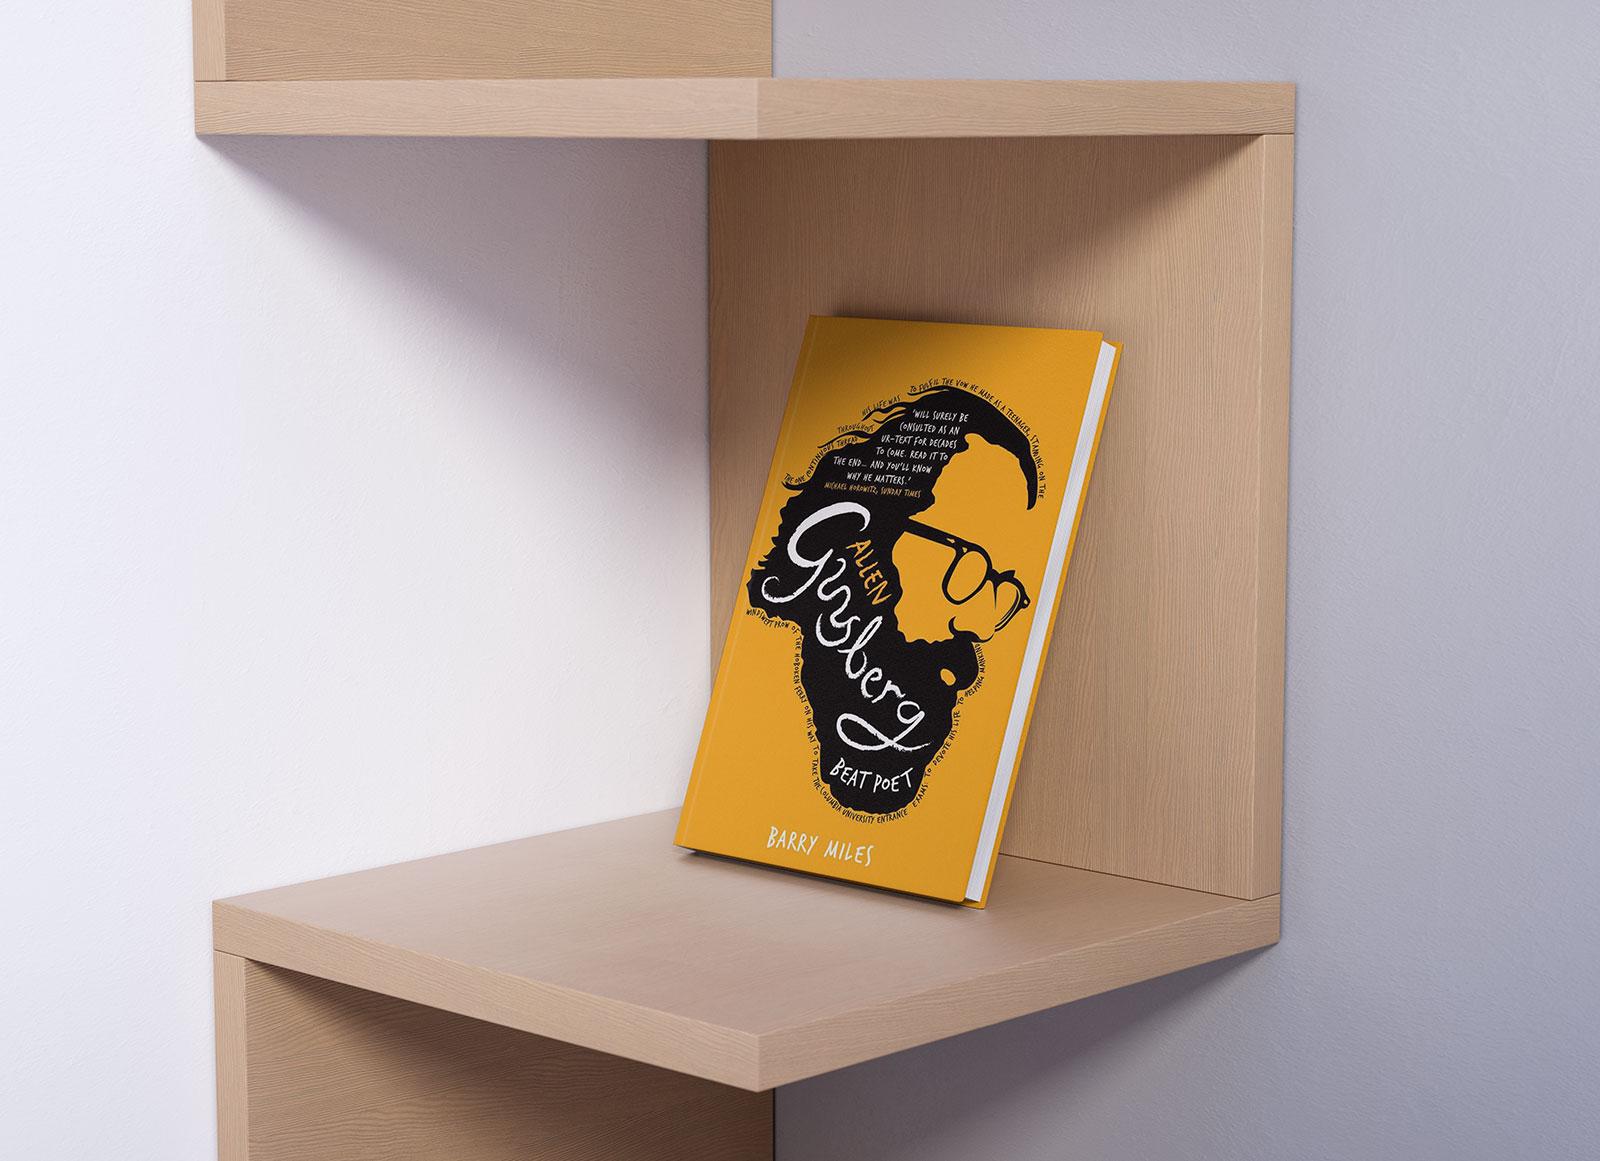 Free Book On Shelf Mockup PSD